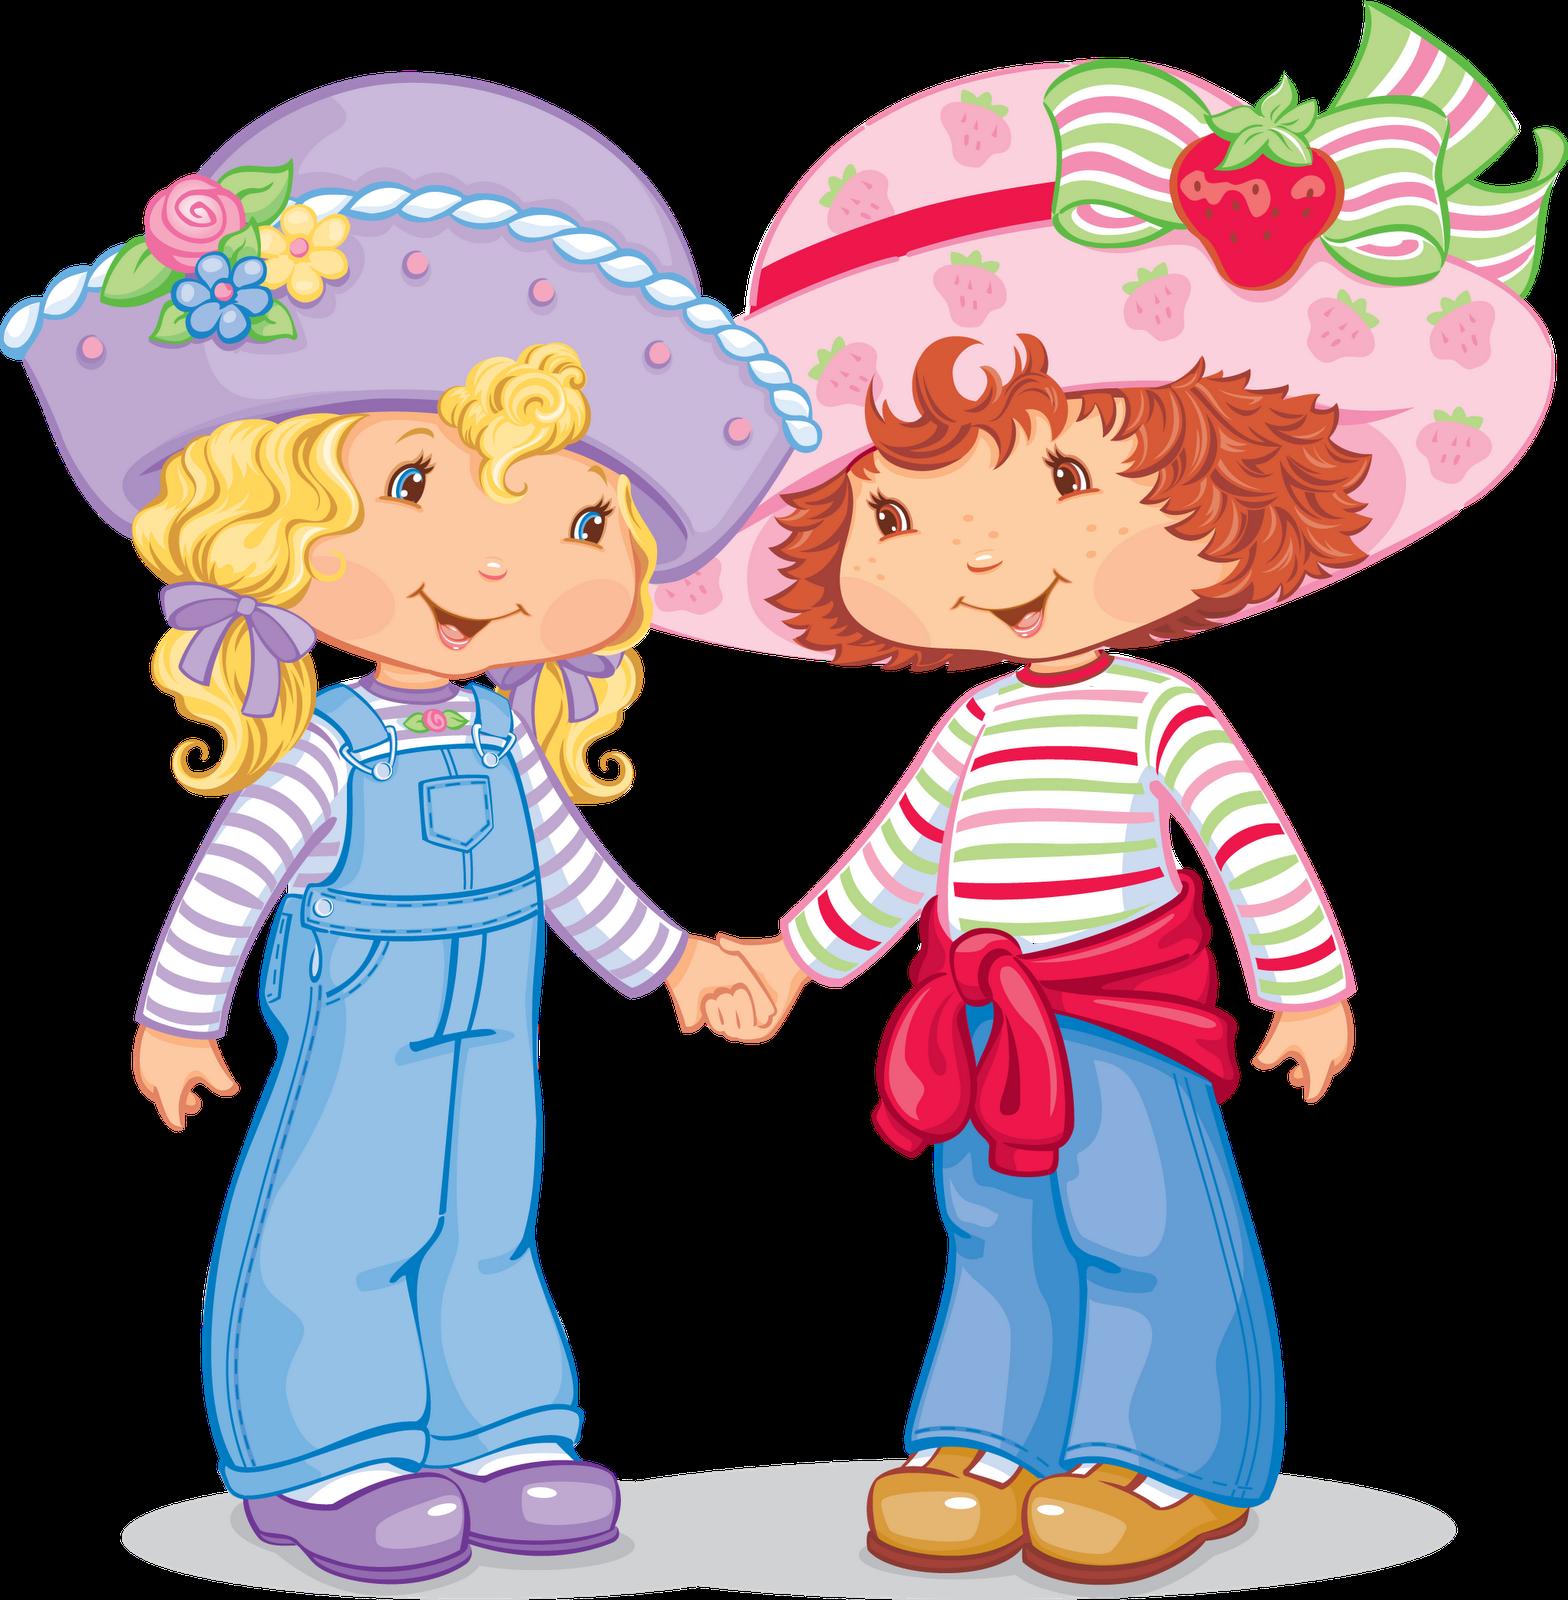 Pie clipart lemon meringue pie. Strawberry shortcake cartoon characters